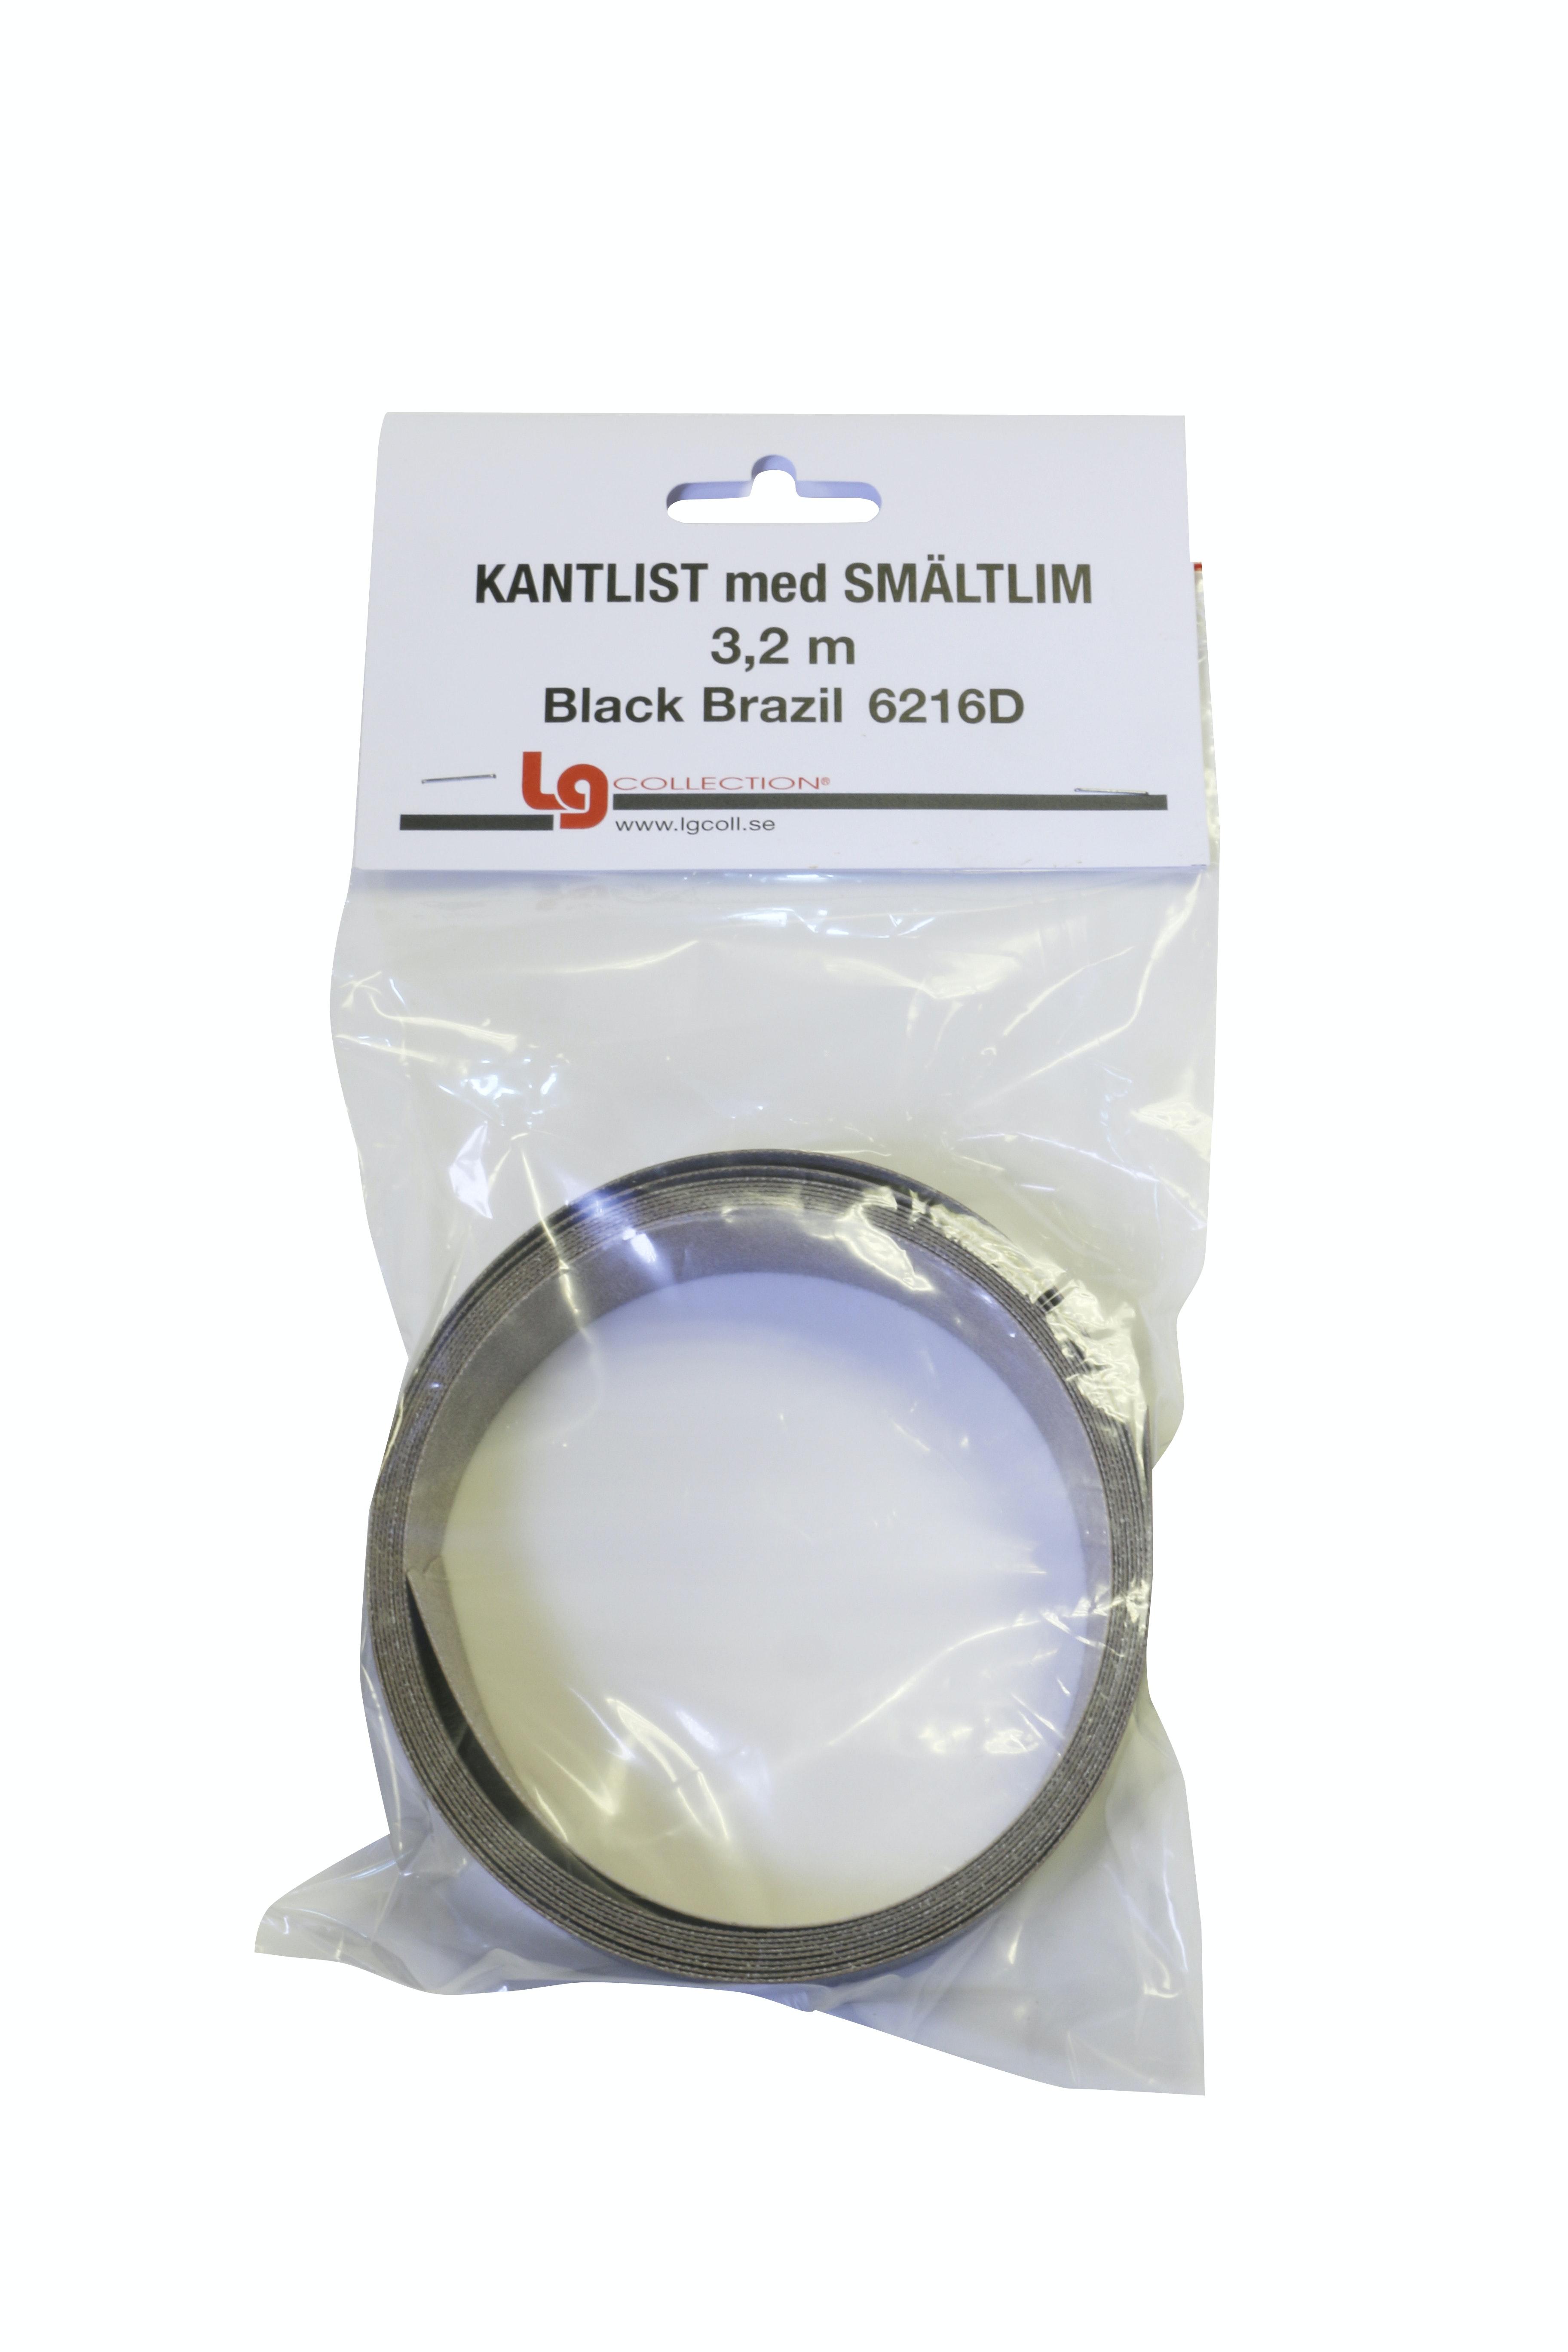 Kantlist LG Collection Sm 3,2m Black Brazil Tc